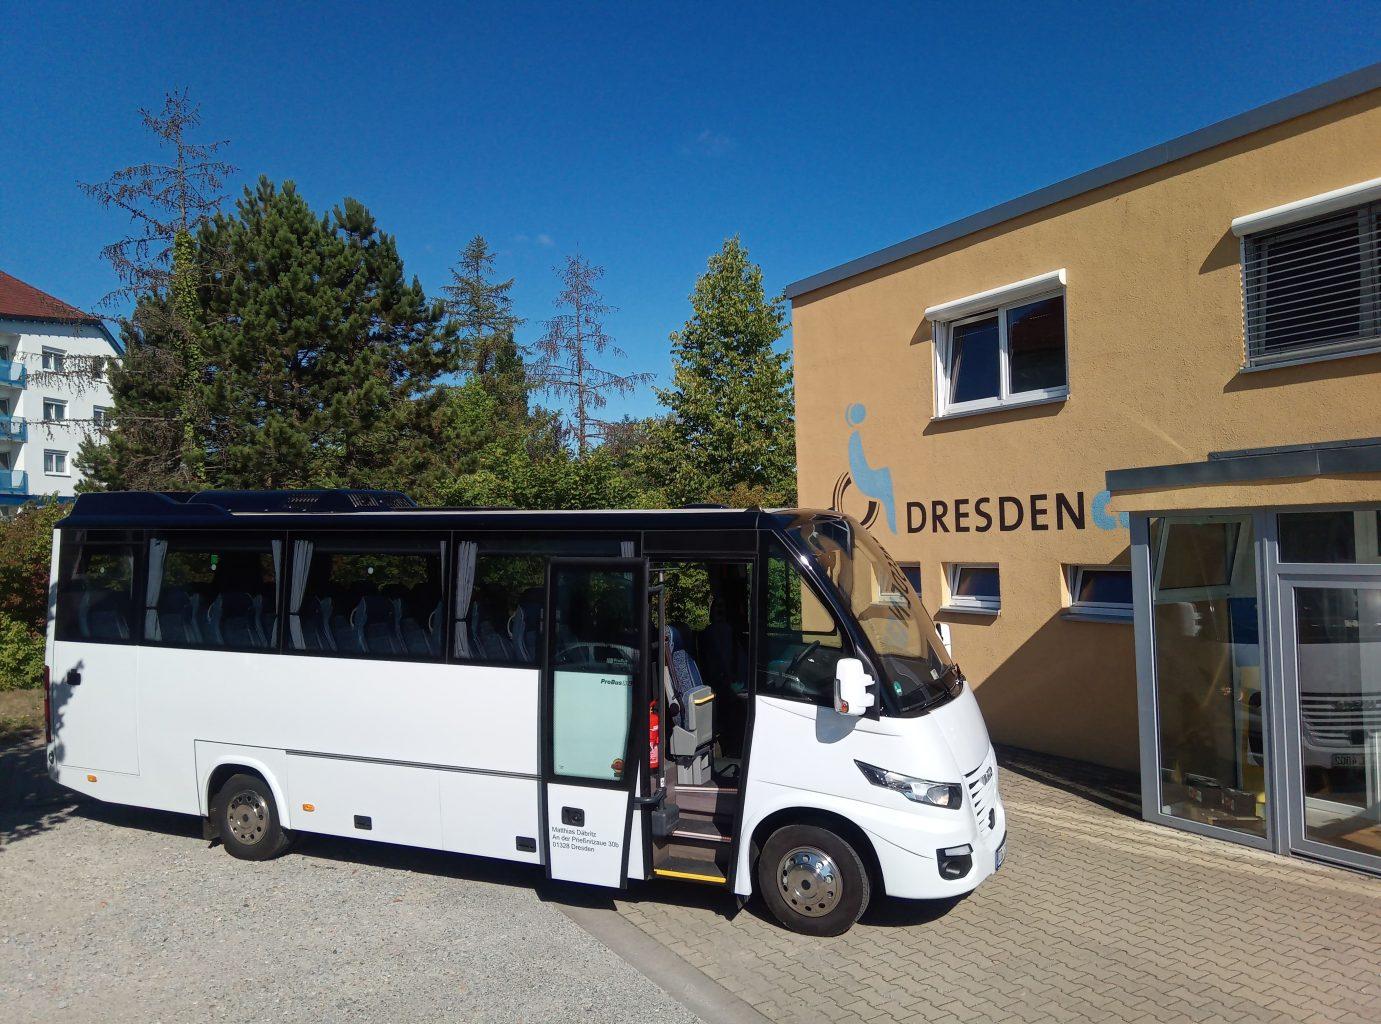 Bus 07, CC0 Johannes